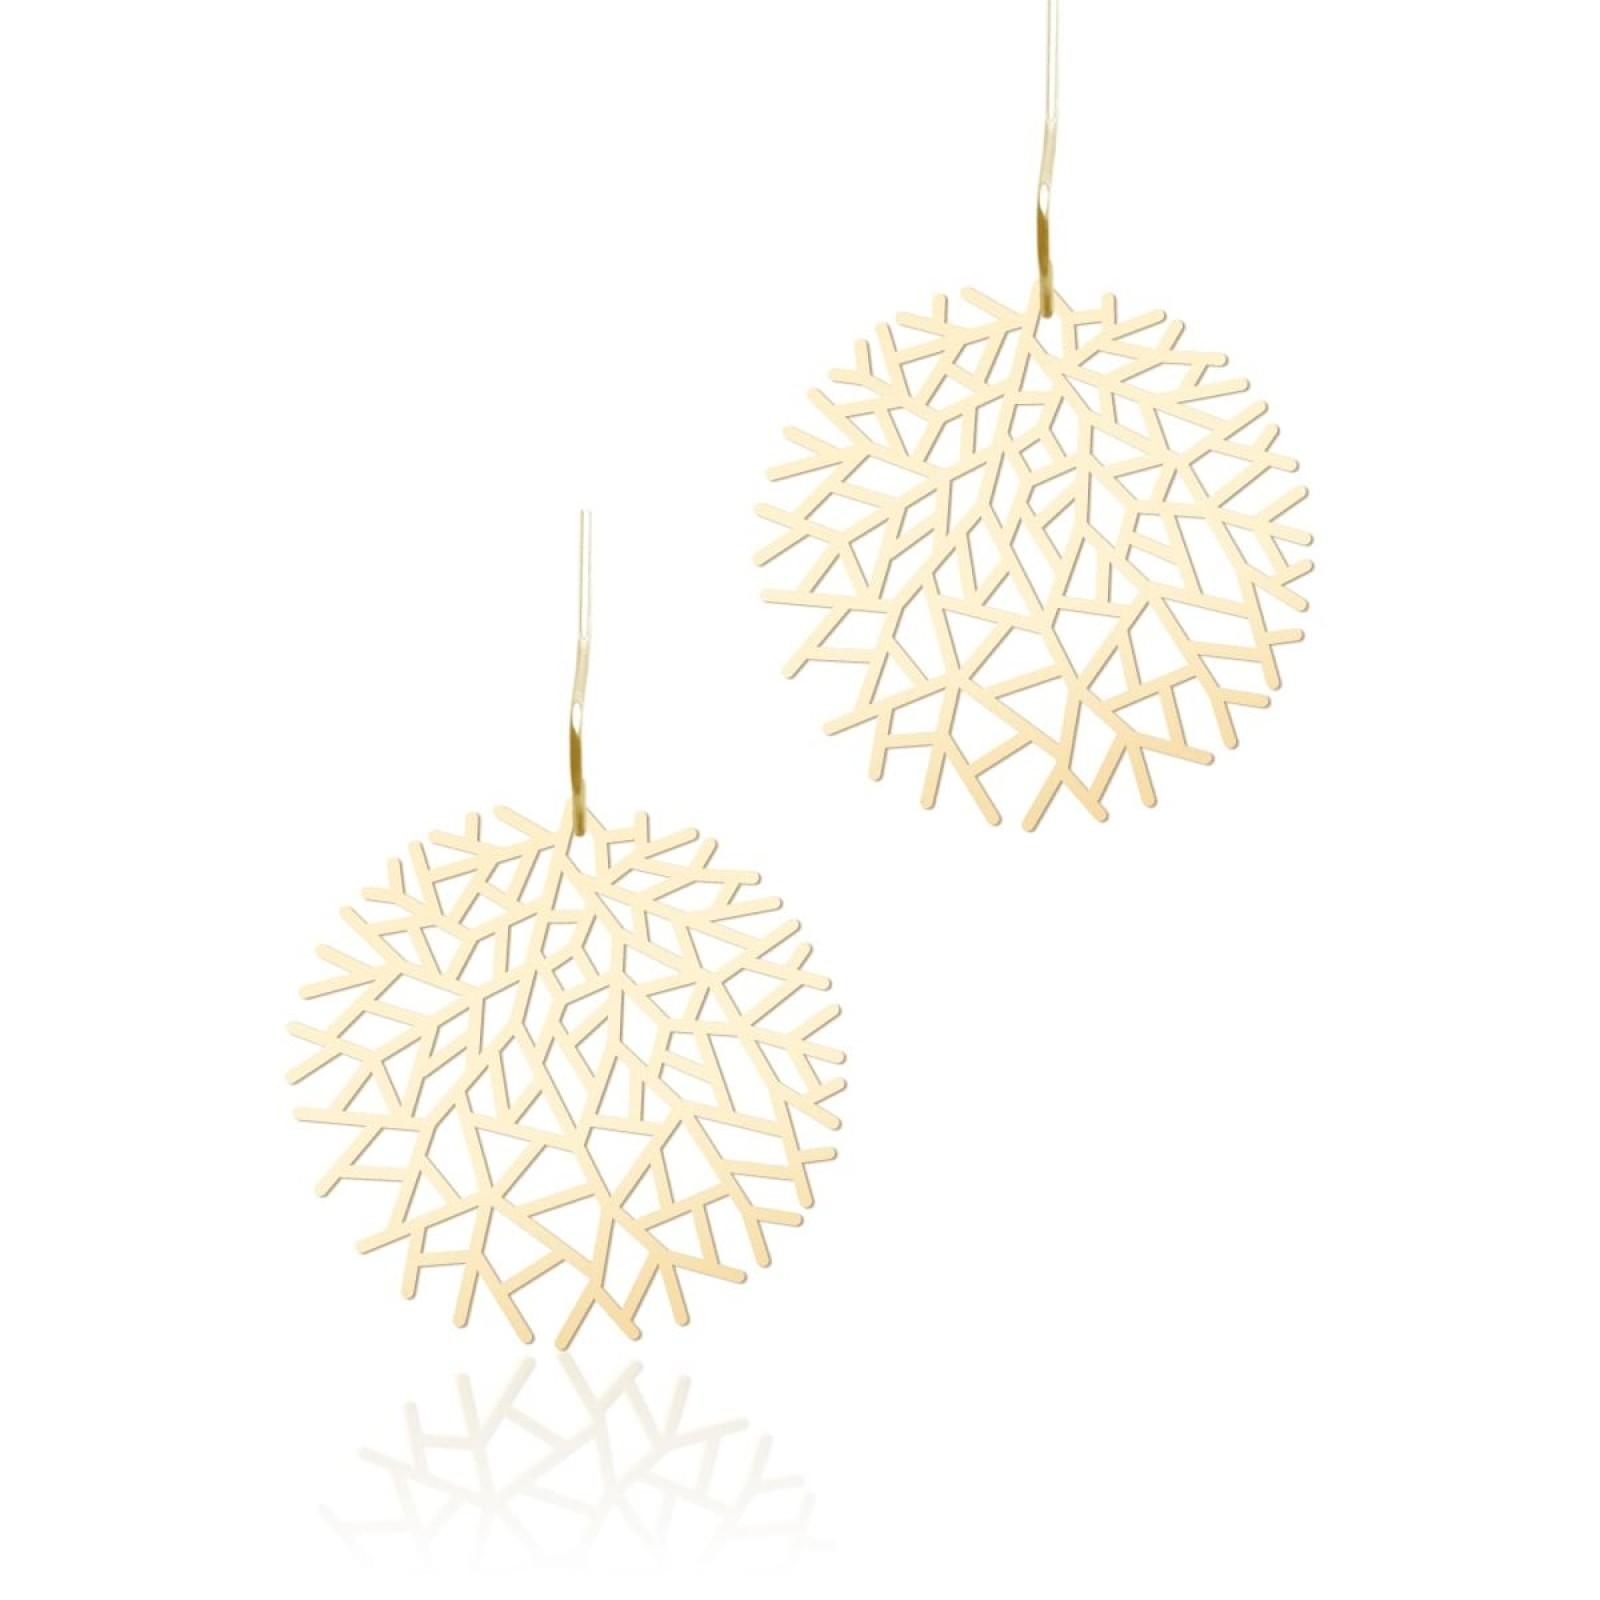 Woods Earrings S (Gold) - Moorigin